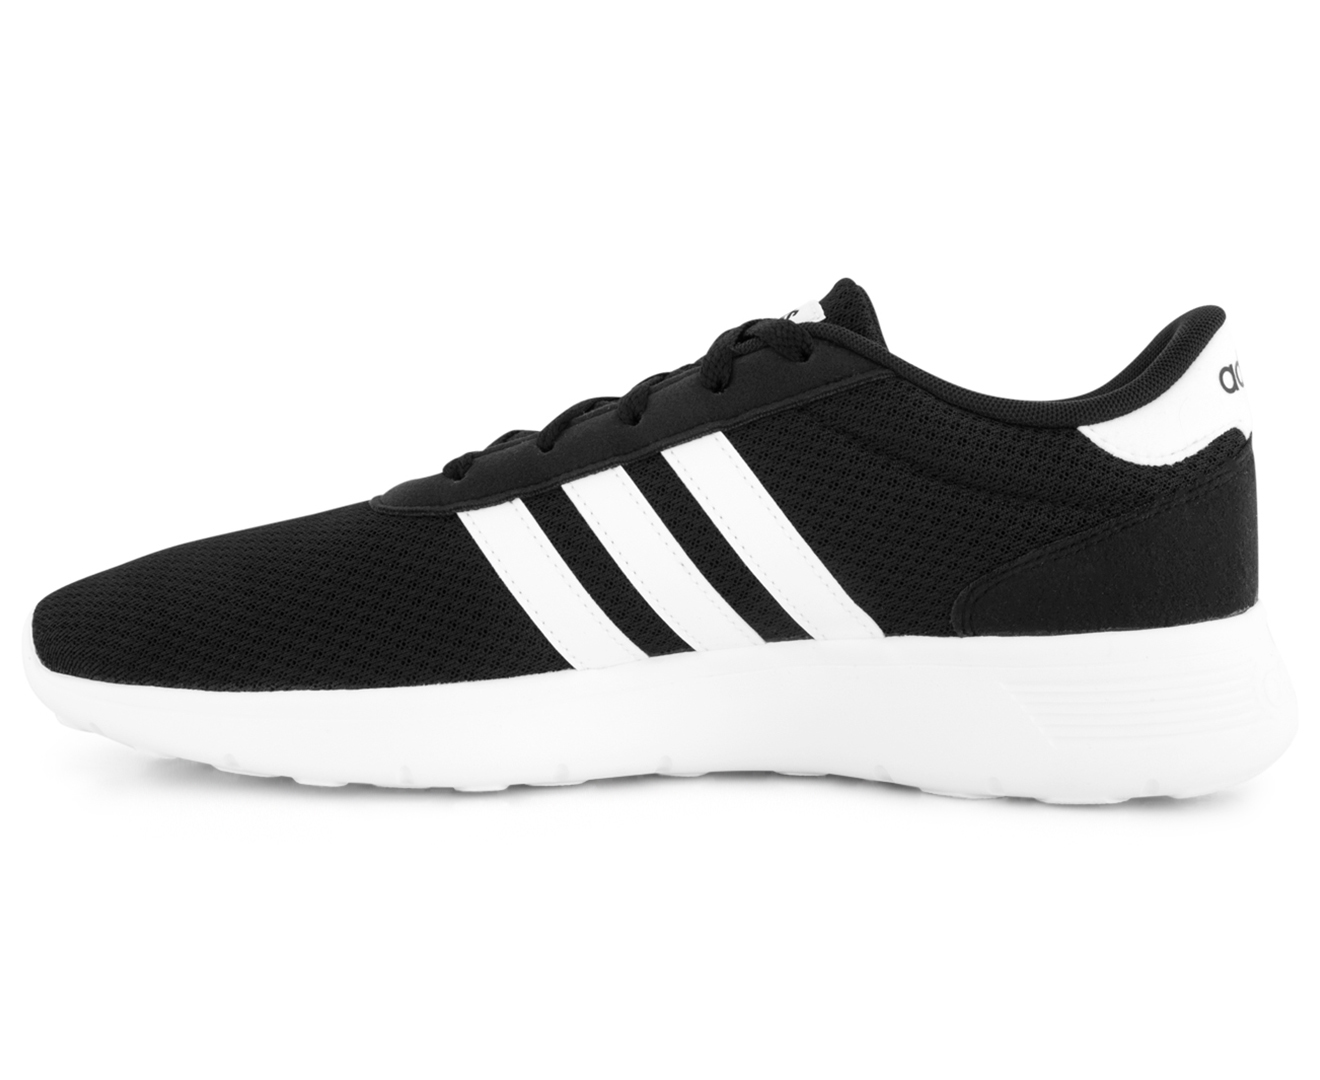 quality design 034e8 5474a Adidas Mens Lite Racer Shoe - Core BlackFootwear White  Scoopon Shopping